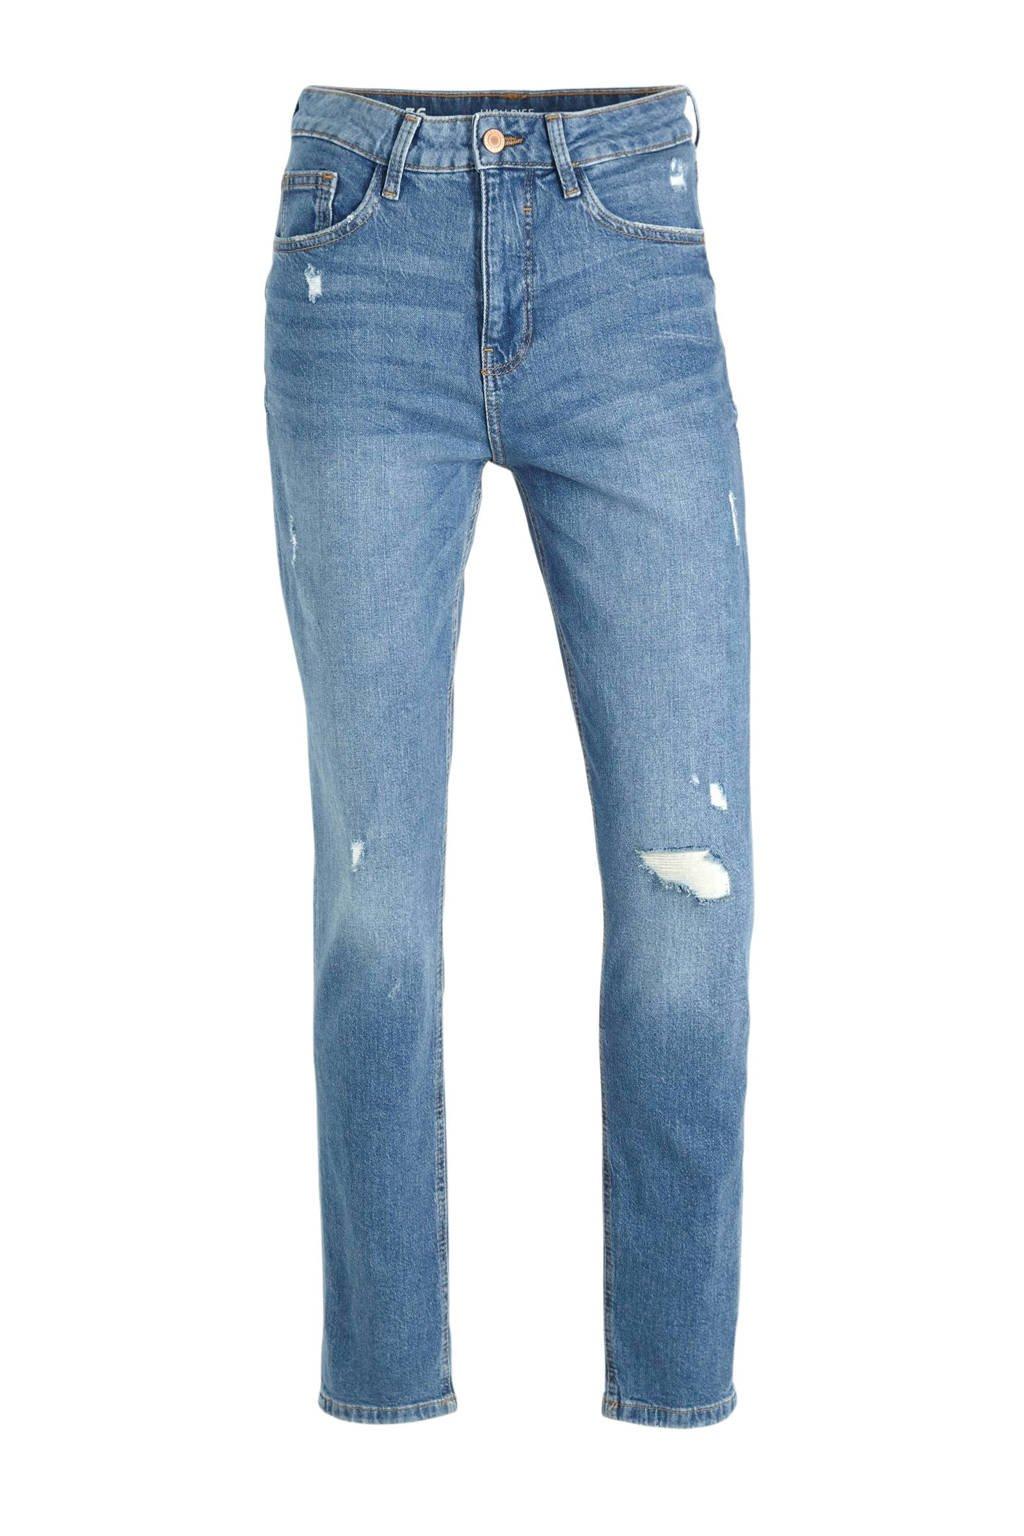 C&A Clockhouse high waist mom jeans blauw, Blauw